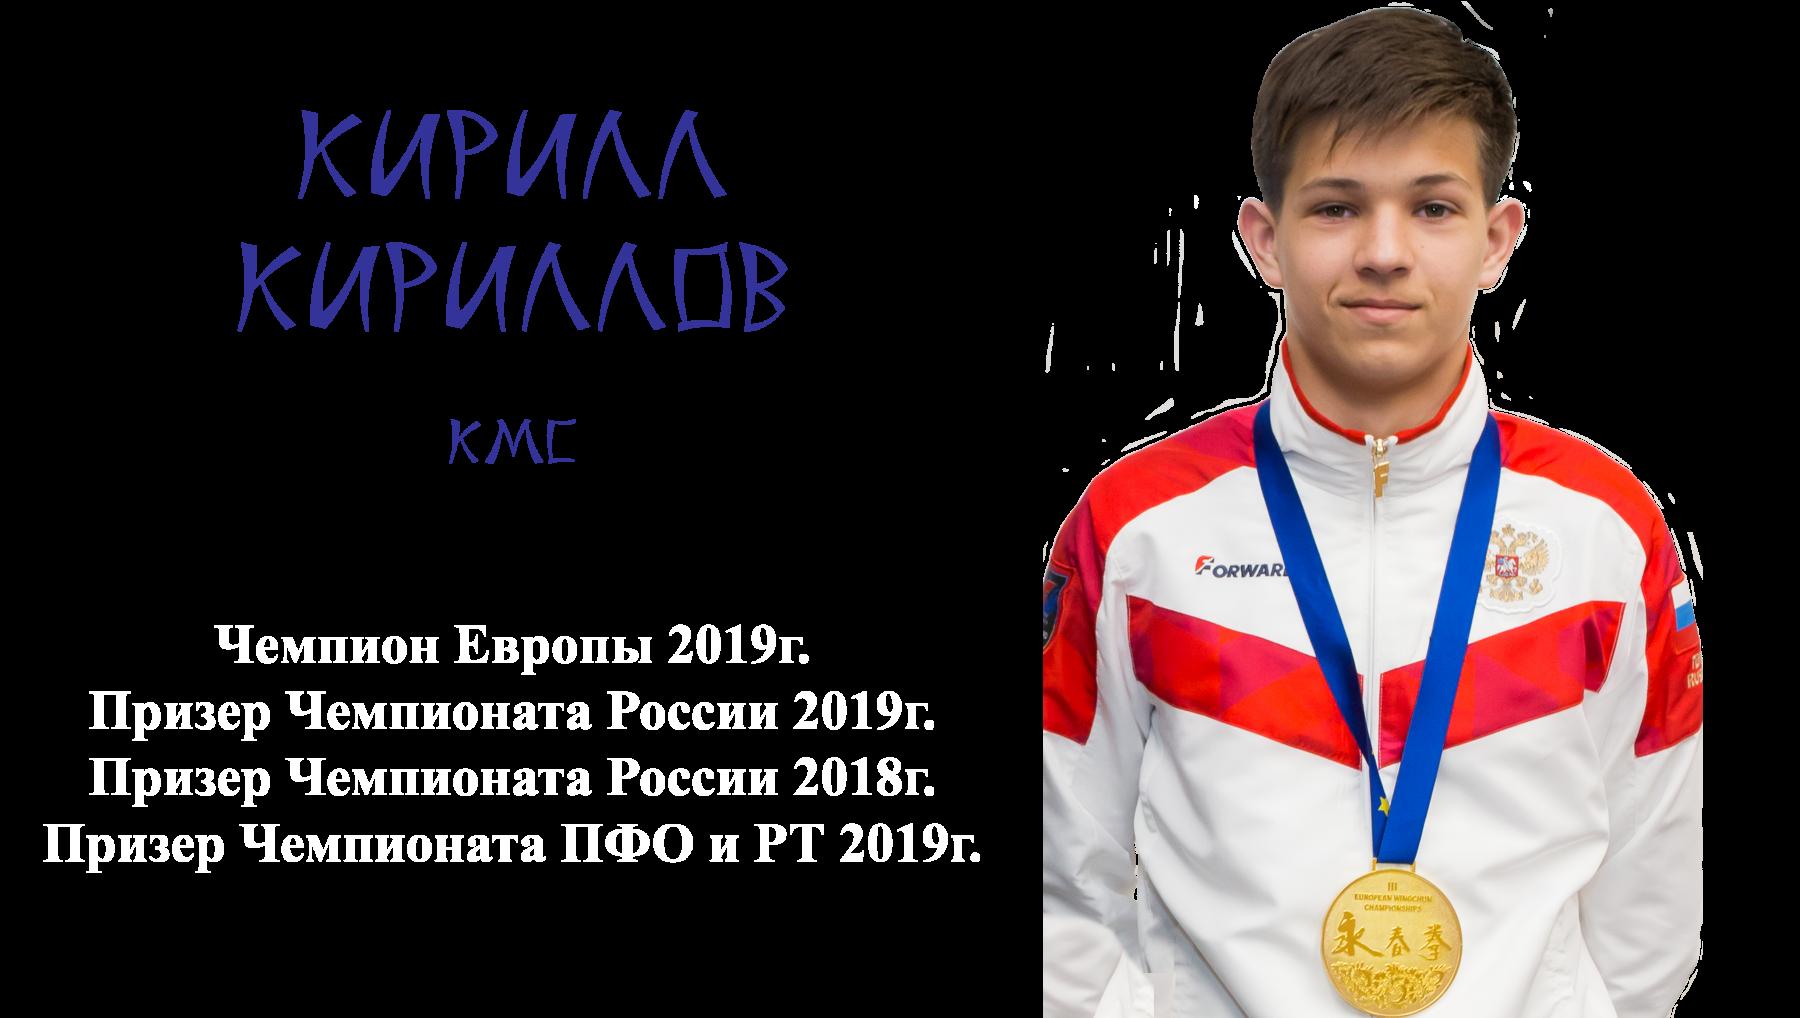 kirillovk